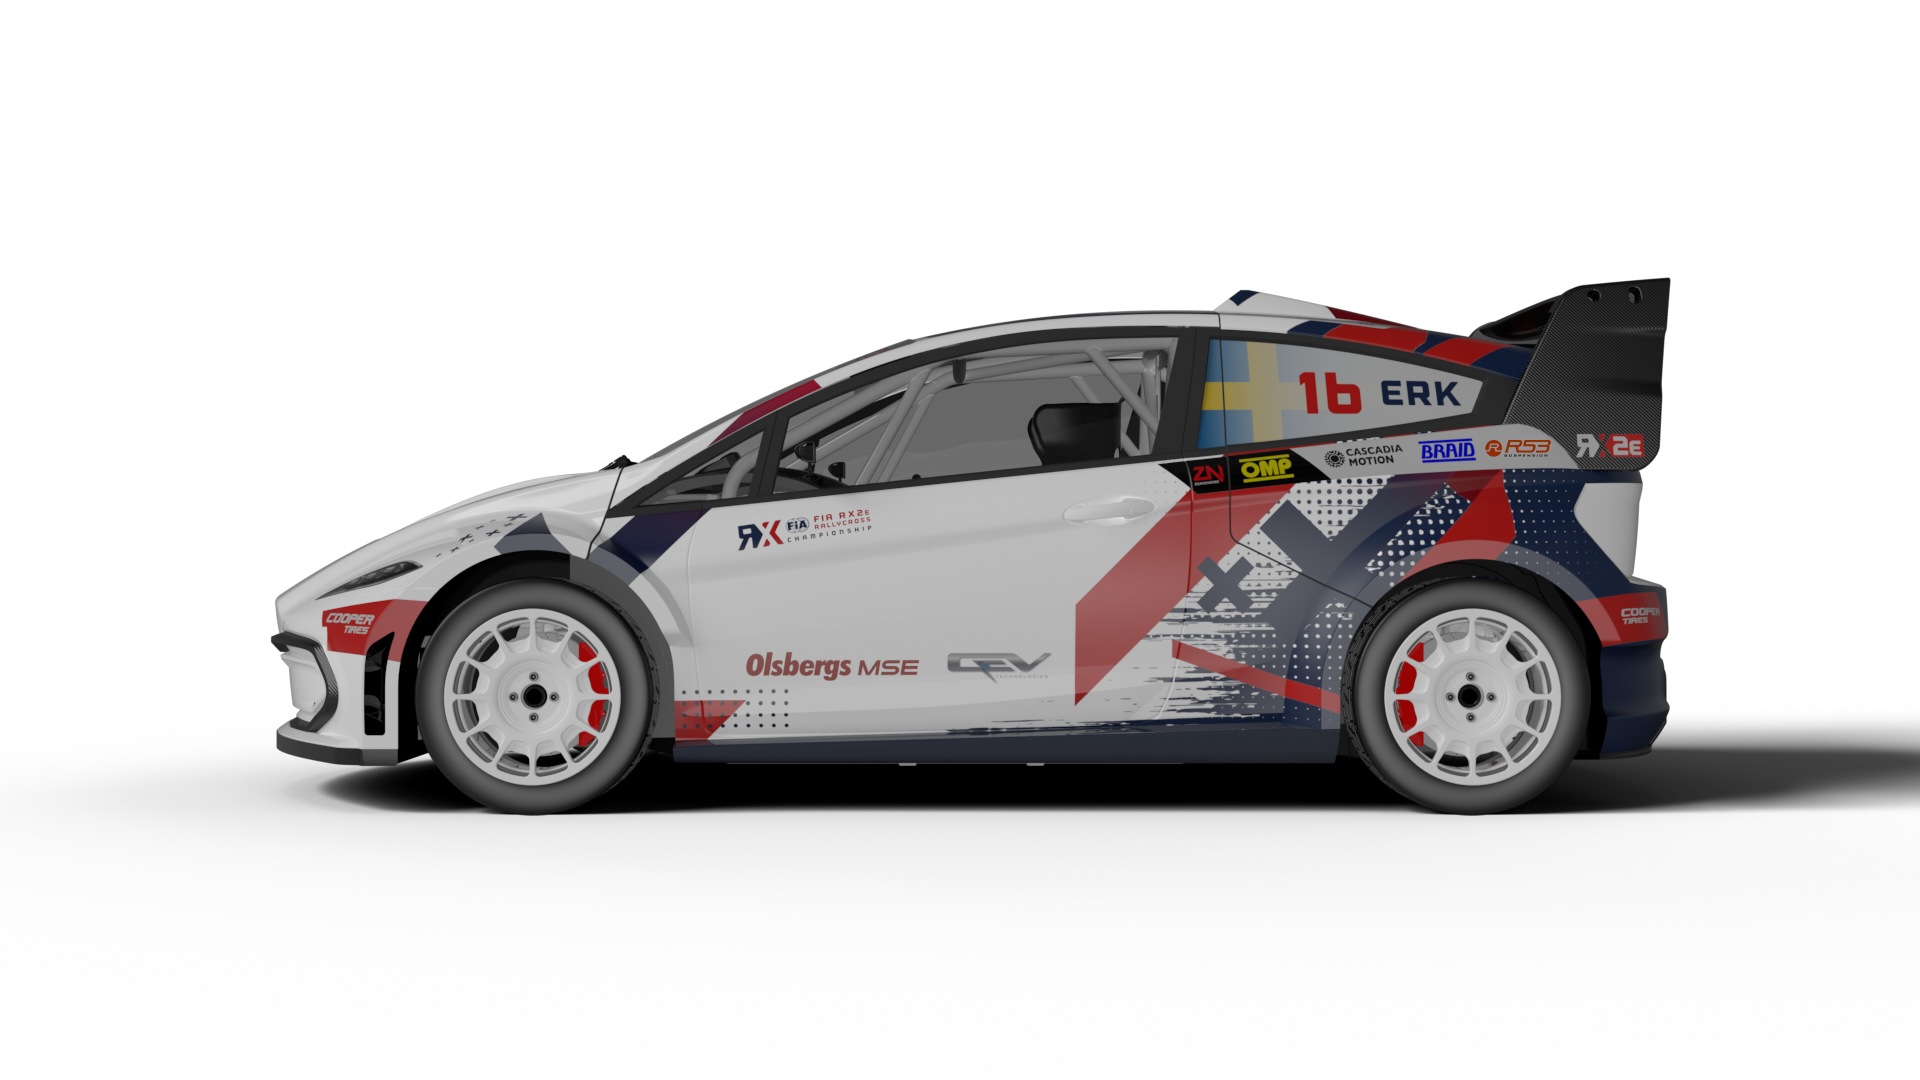 全新FIA RX2e Championship赛车正式发布, QEV